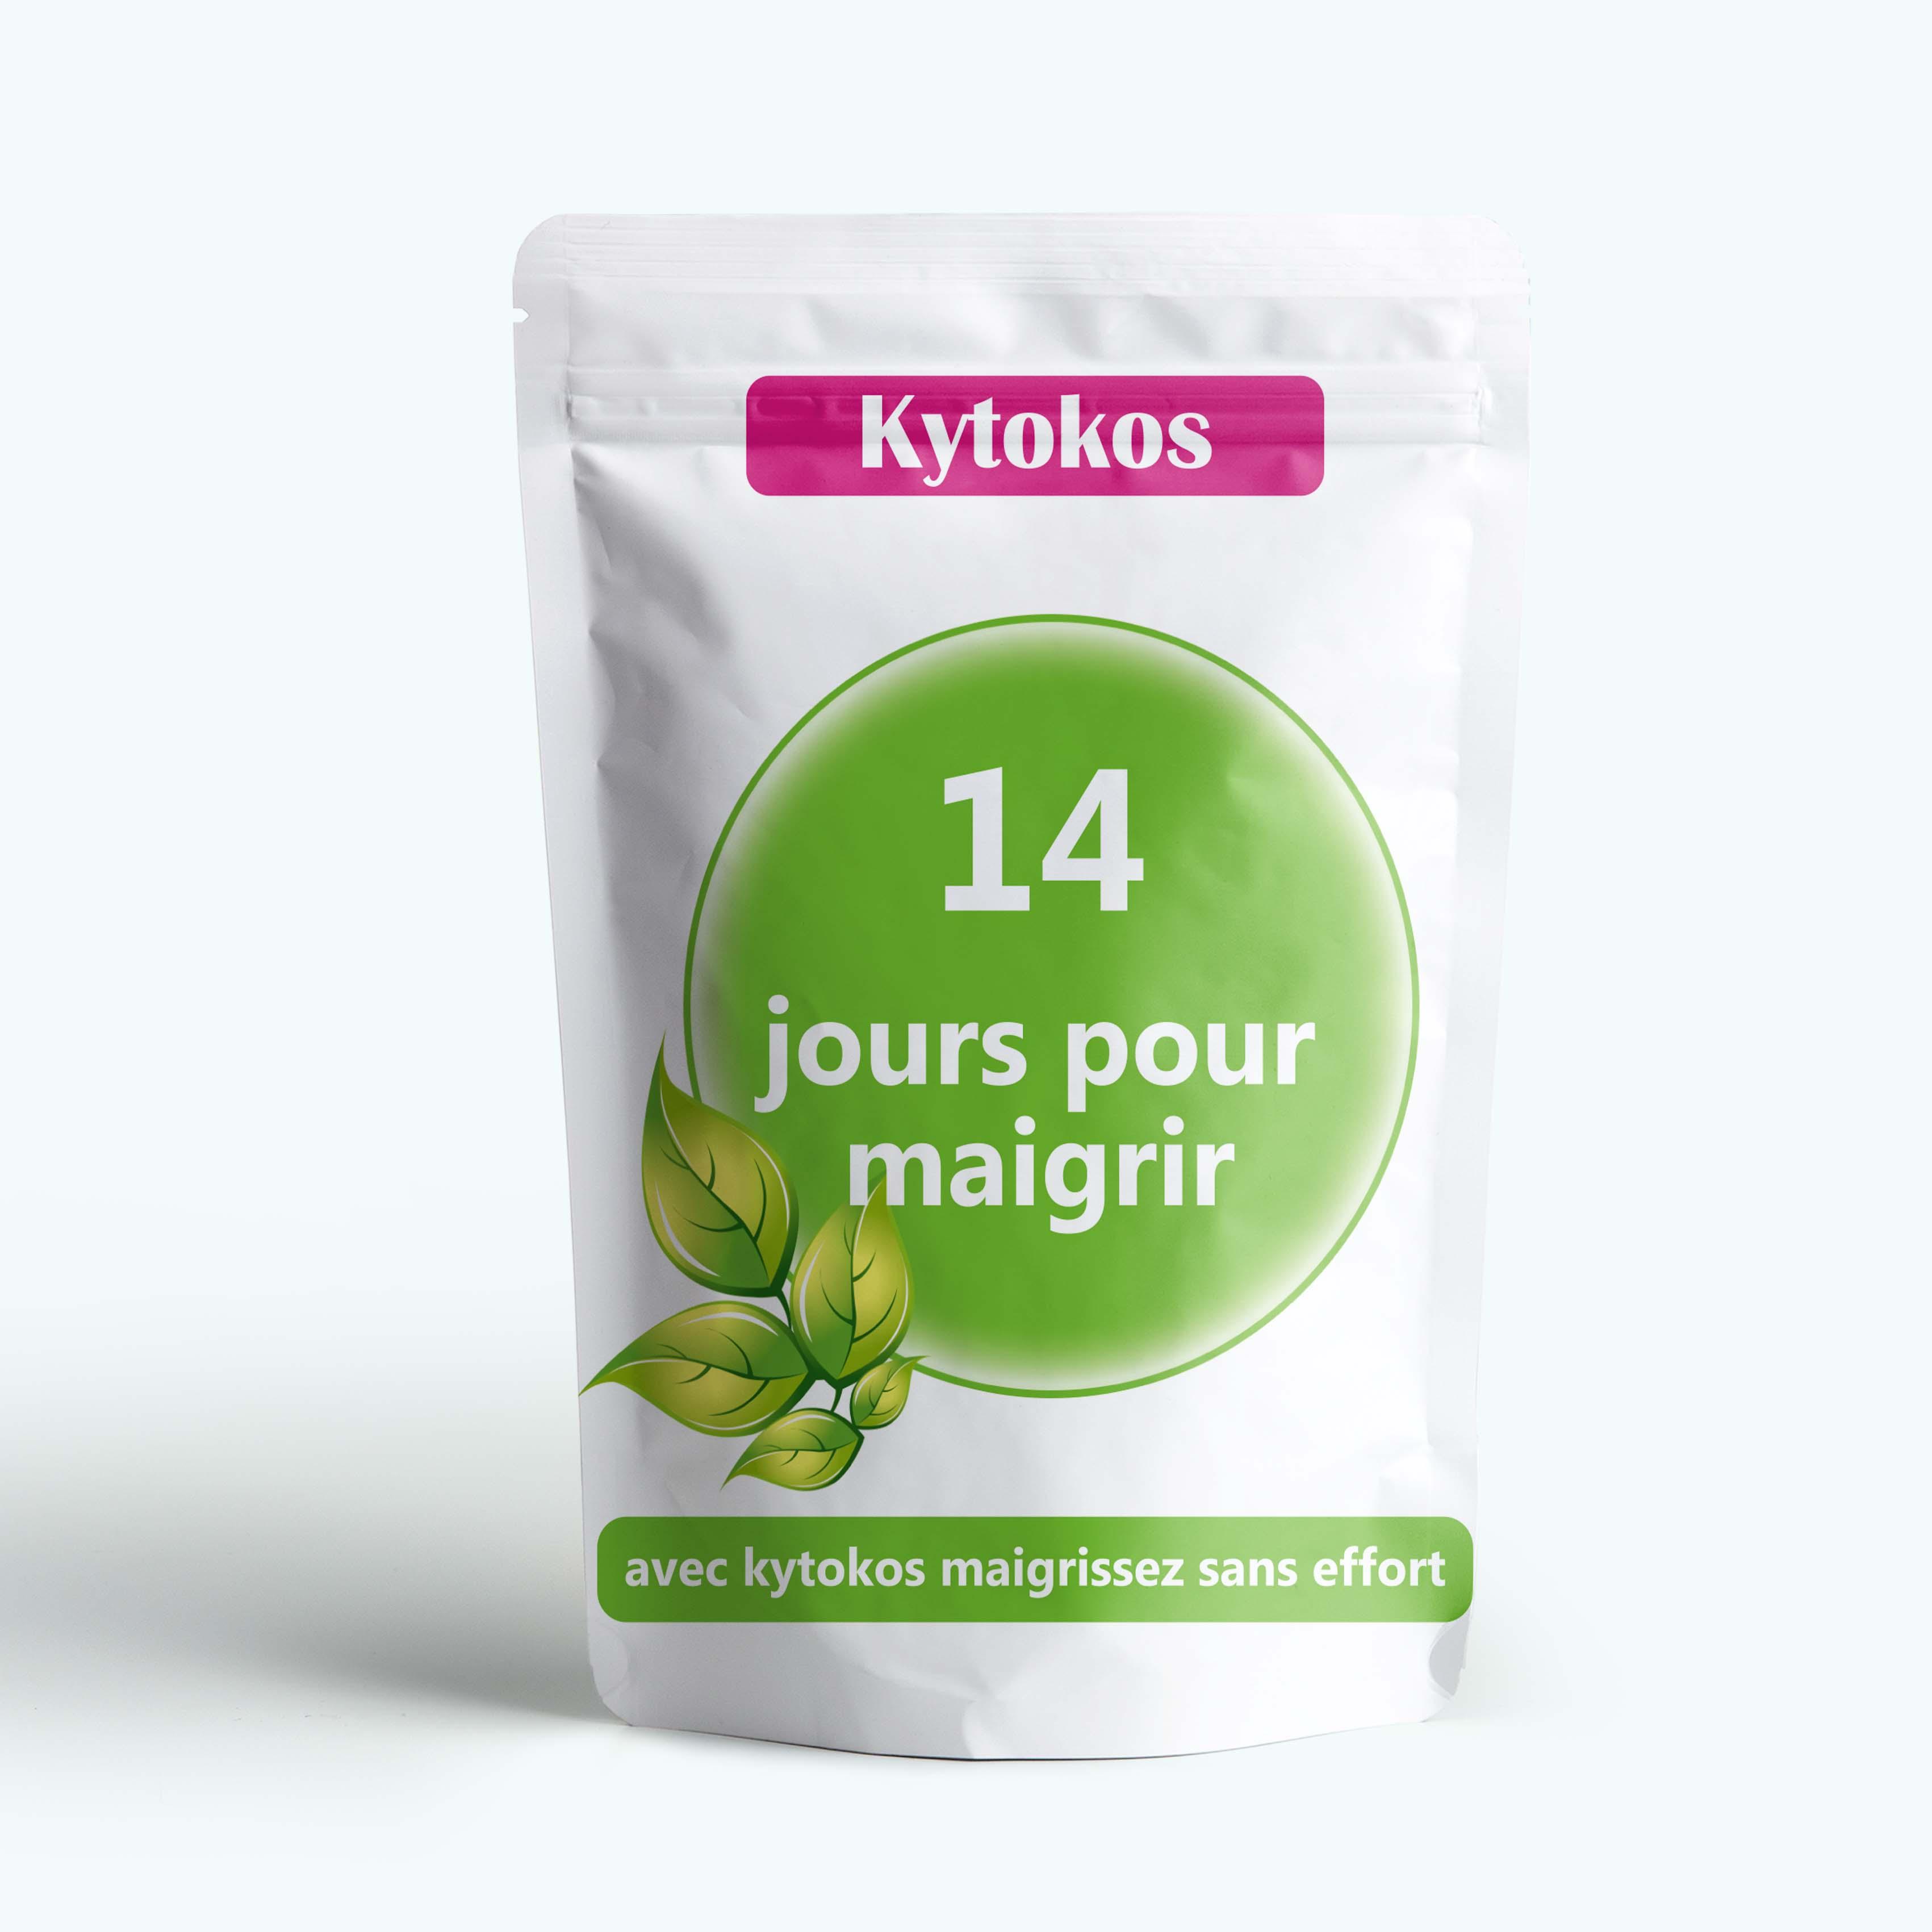 Twinings of London Pure Peppermint Herbal Tea Bags, 28 Count (Pack of 1) - 4uTea | 4uTea.com